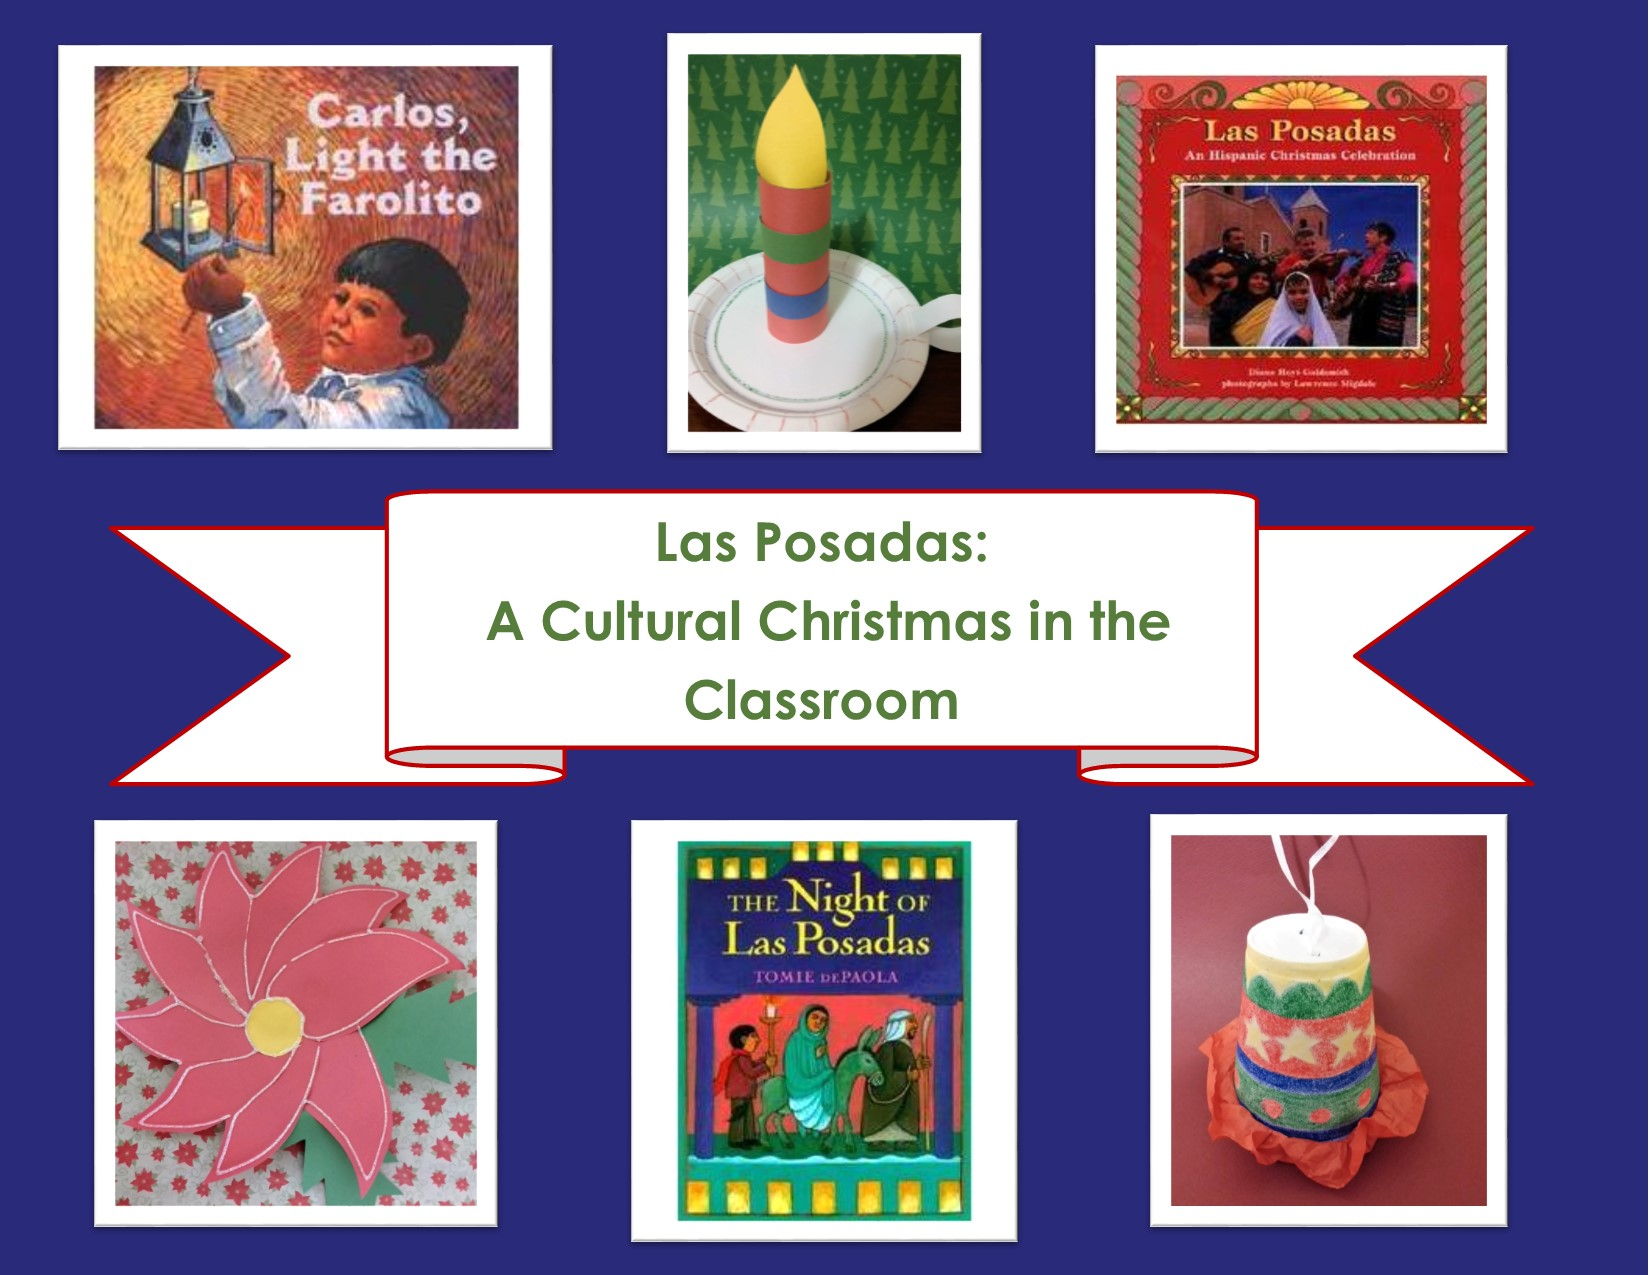 Las Posadas A Cultural Christmas In The Classroom